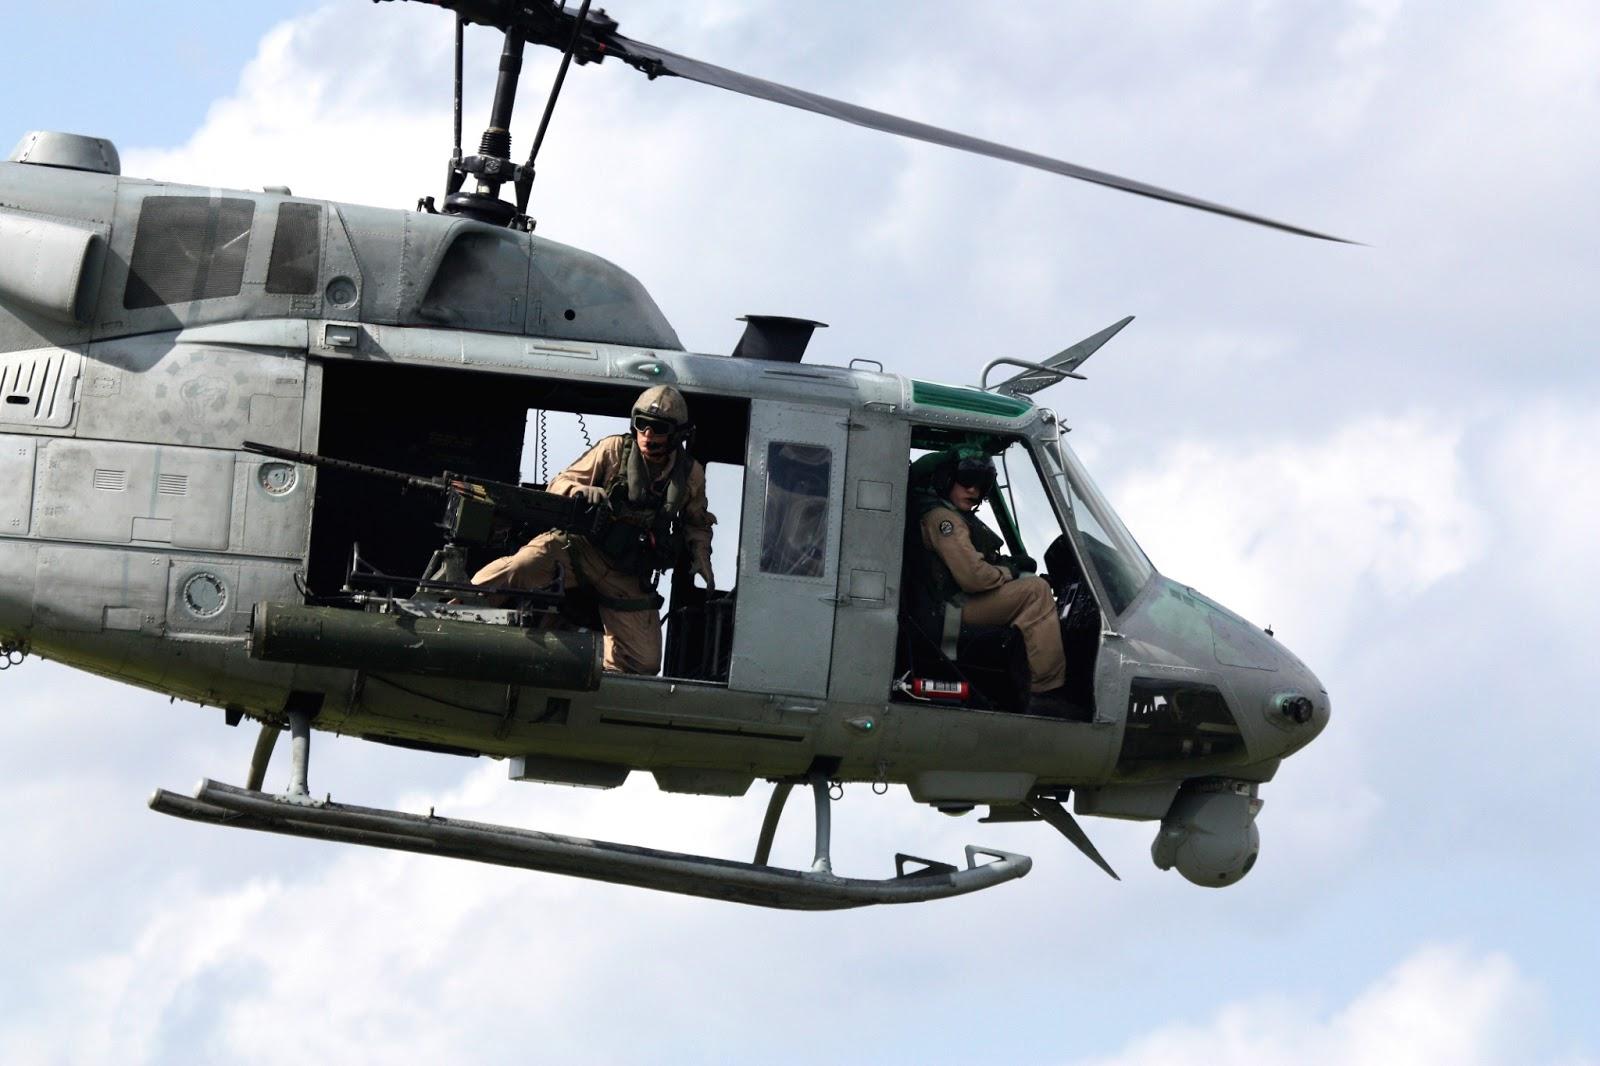 Bell UH-1 Iroquois (Huey)